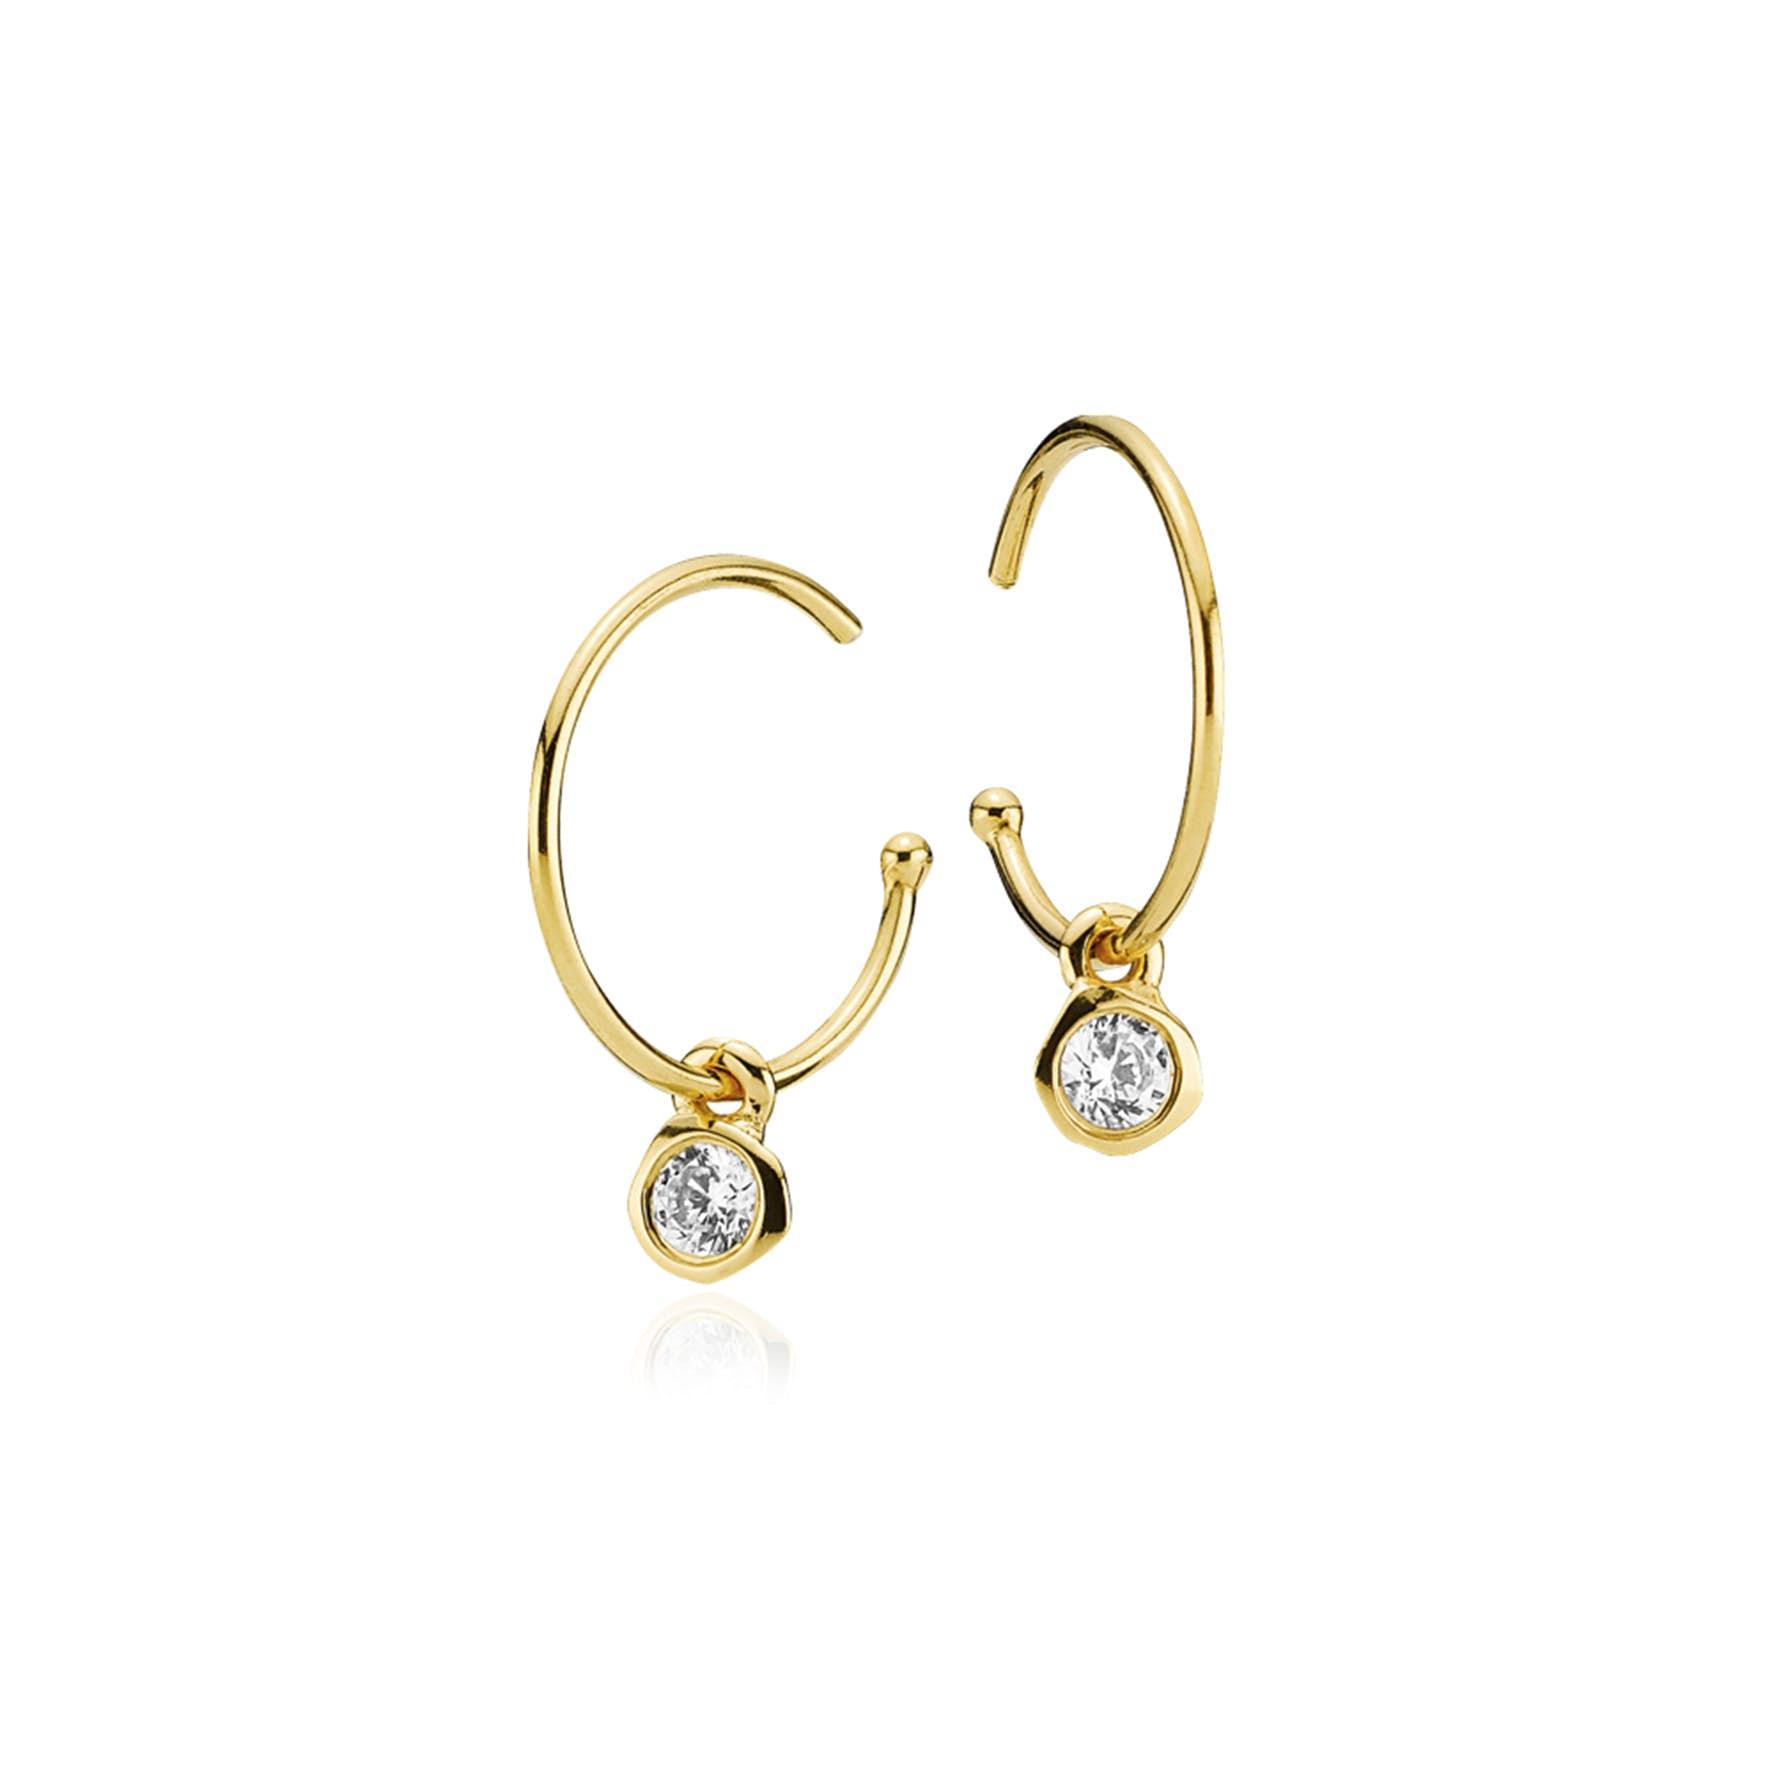 Passion Clear Crystal Earrings fra Izabel Camille i Forgylt-Sølv Sterling 925